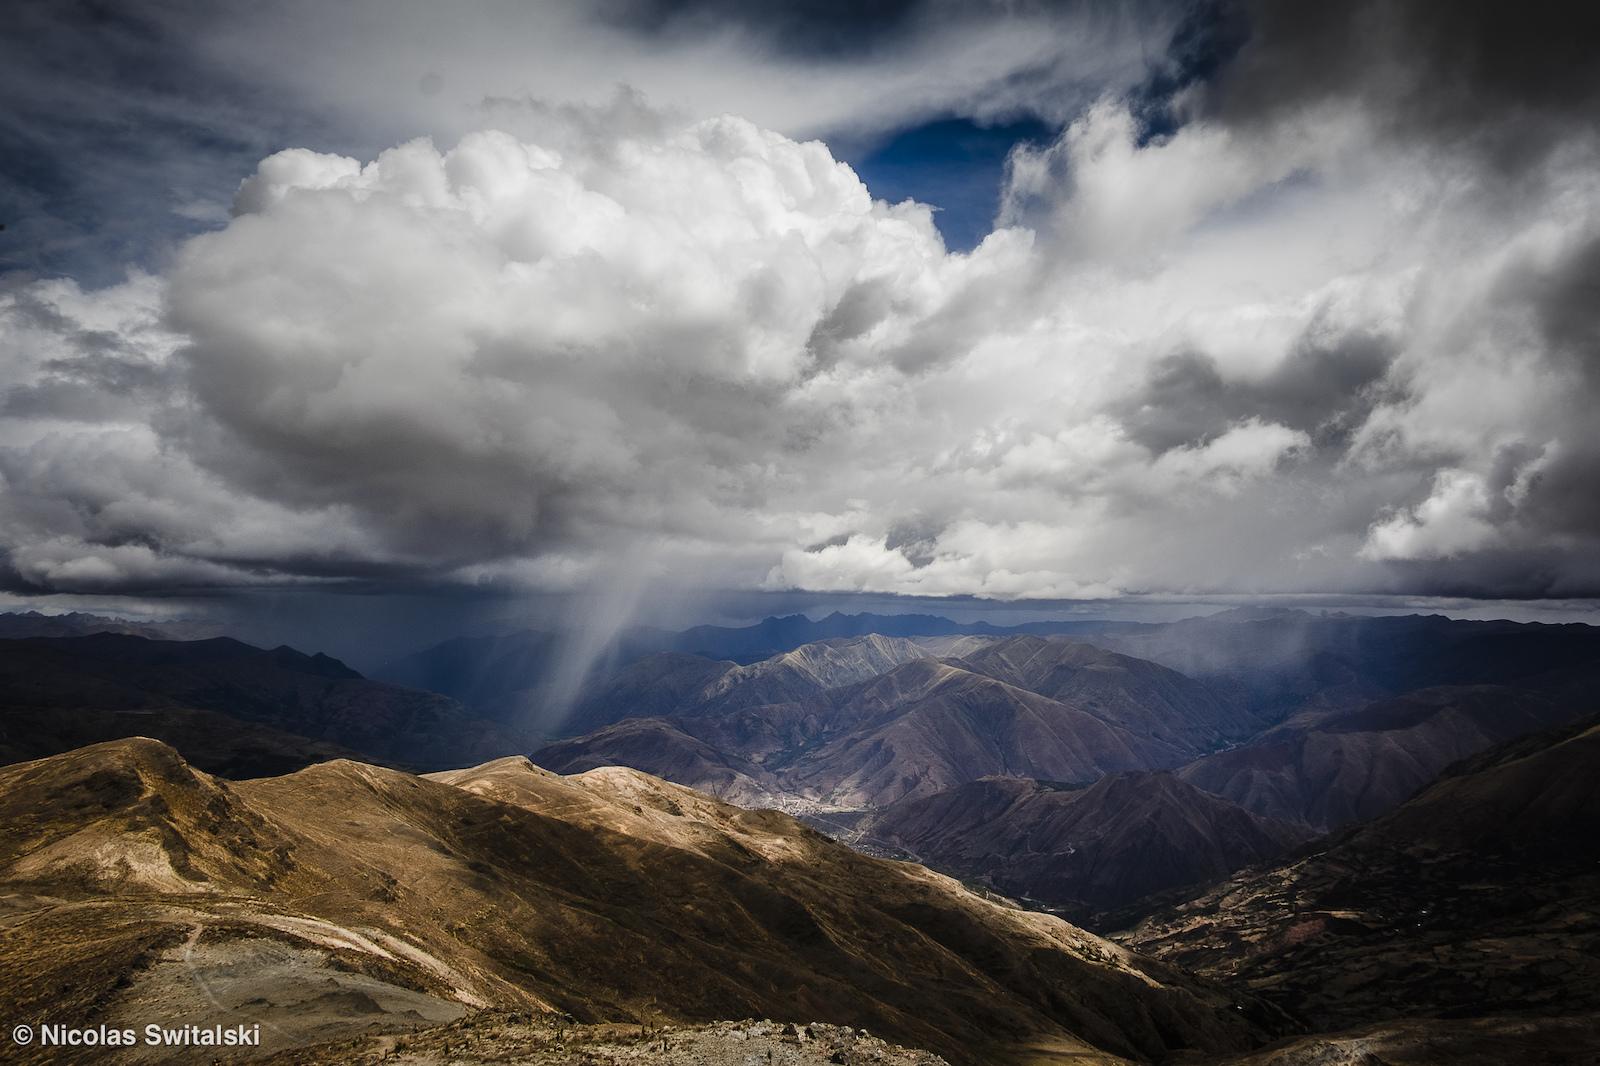 Peru - A Photo Story